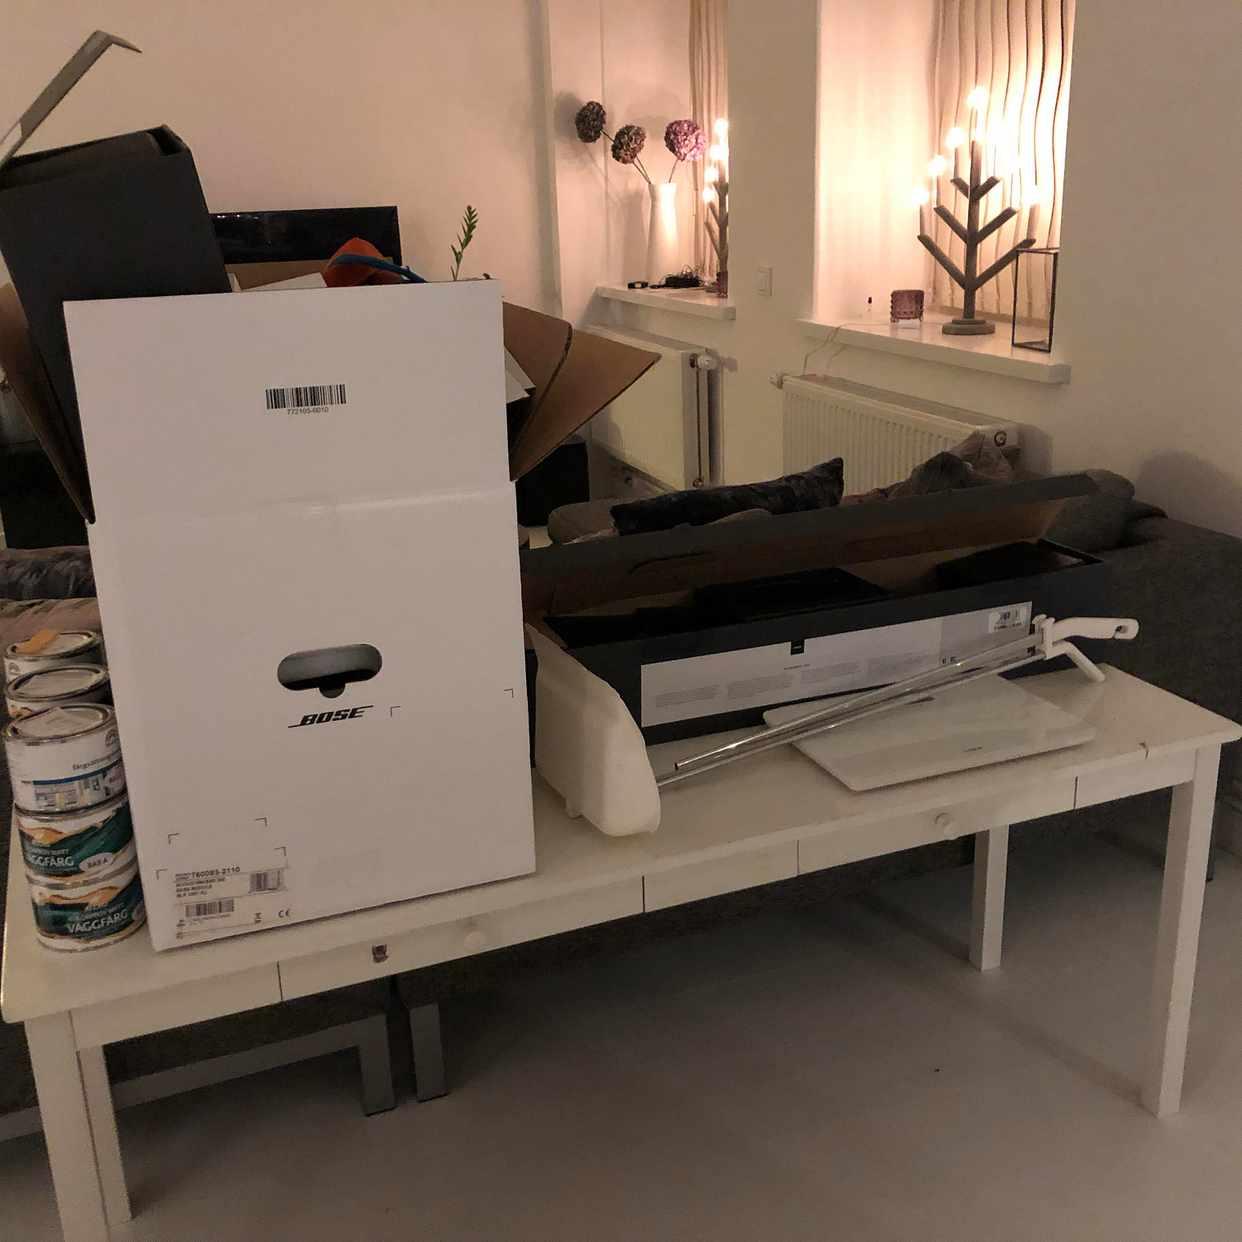 image of Skrivbord, kartonger mm - Stockholms Stad